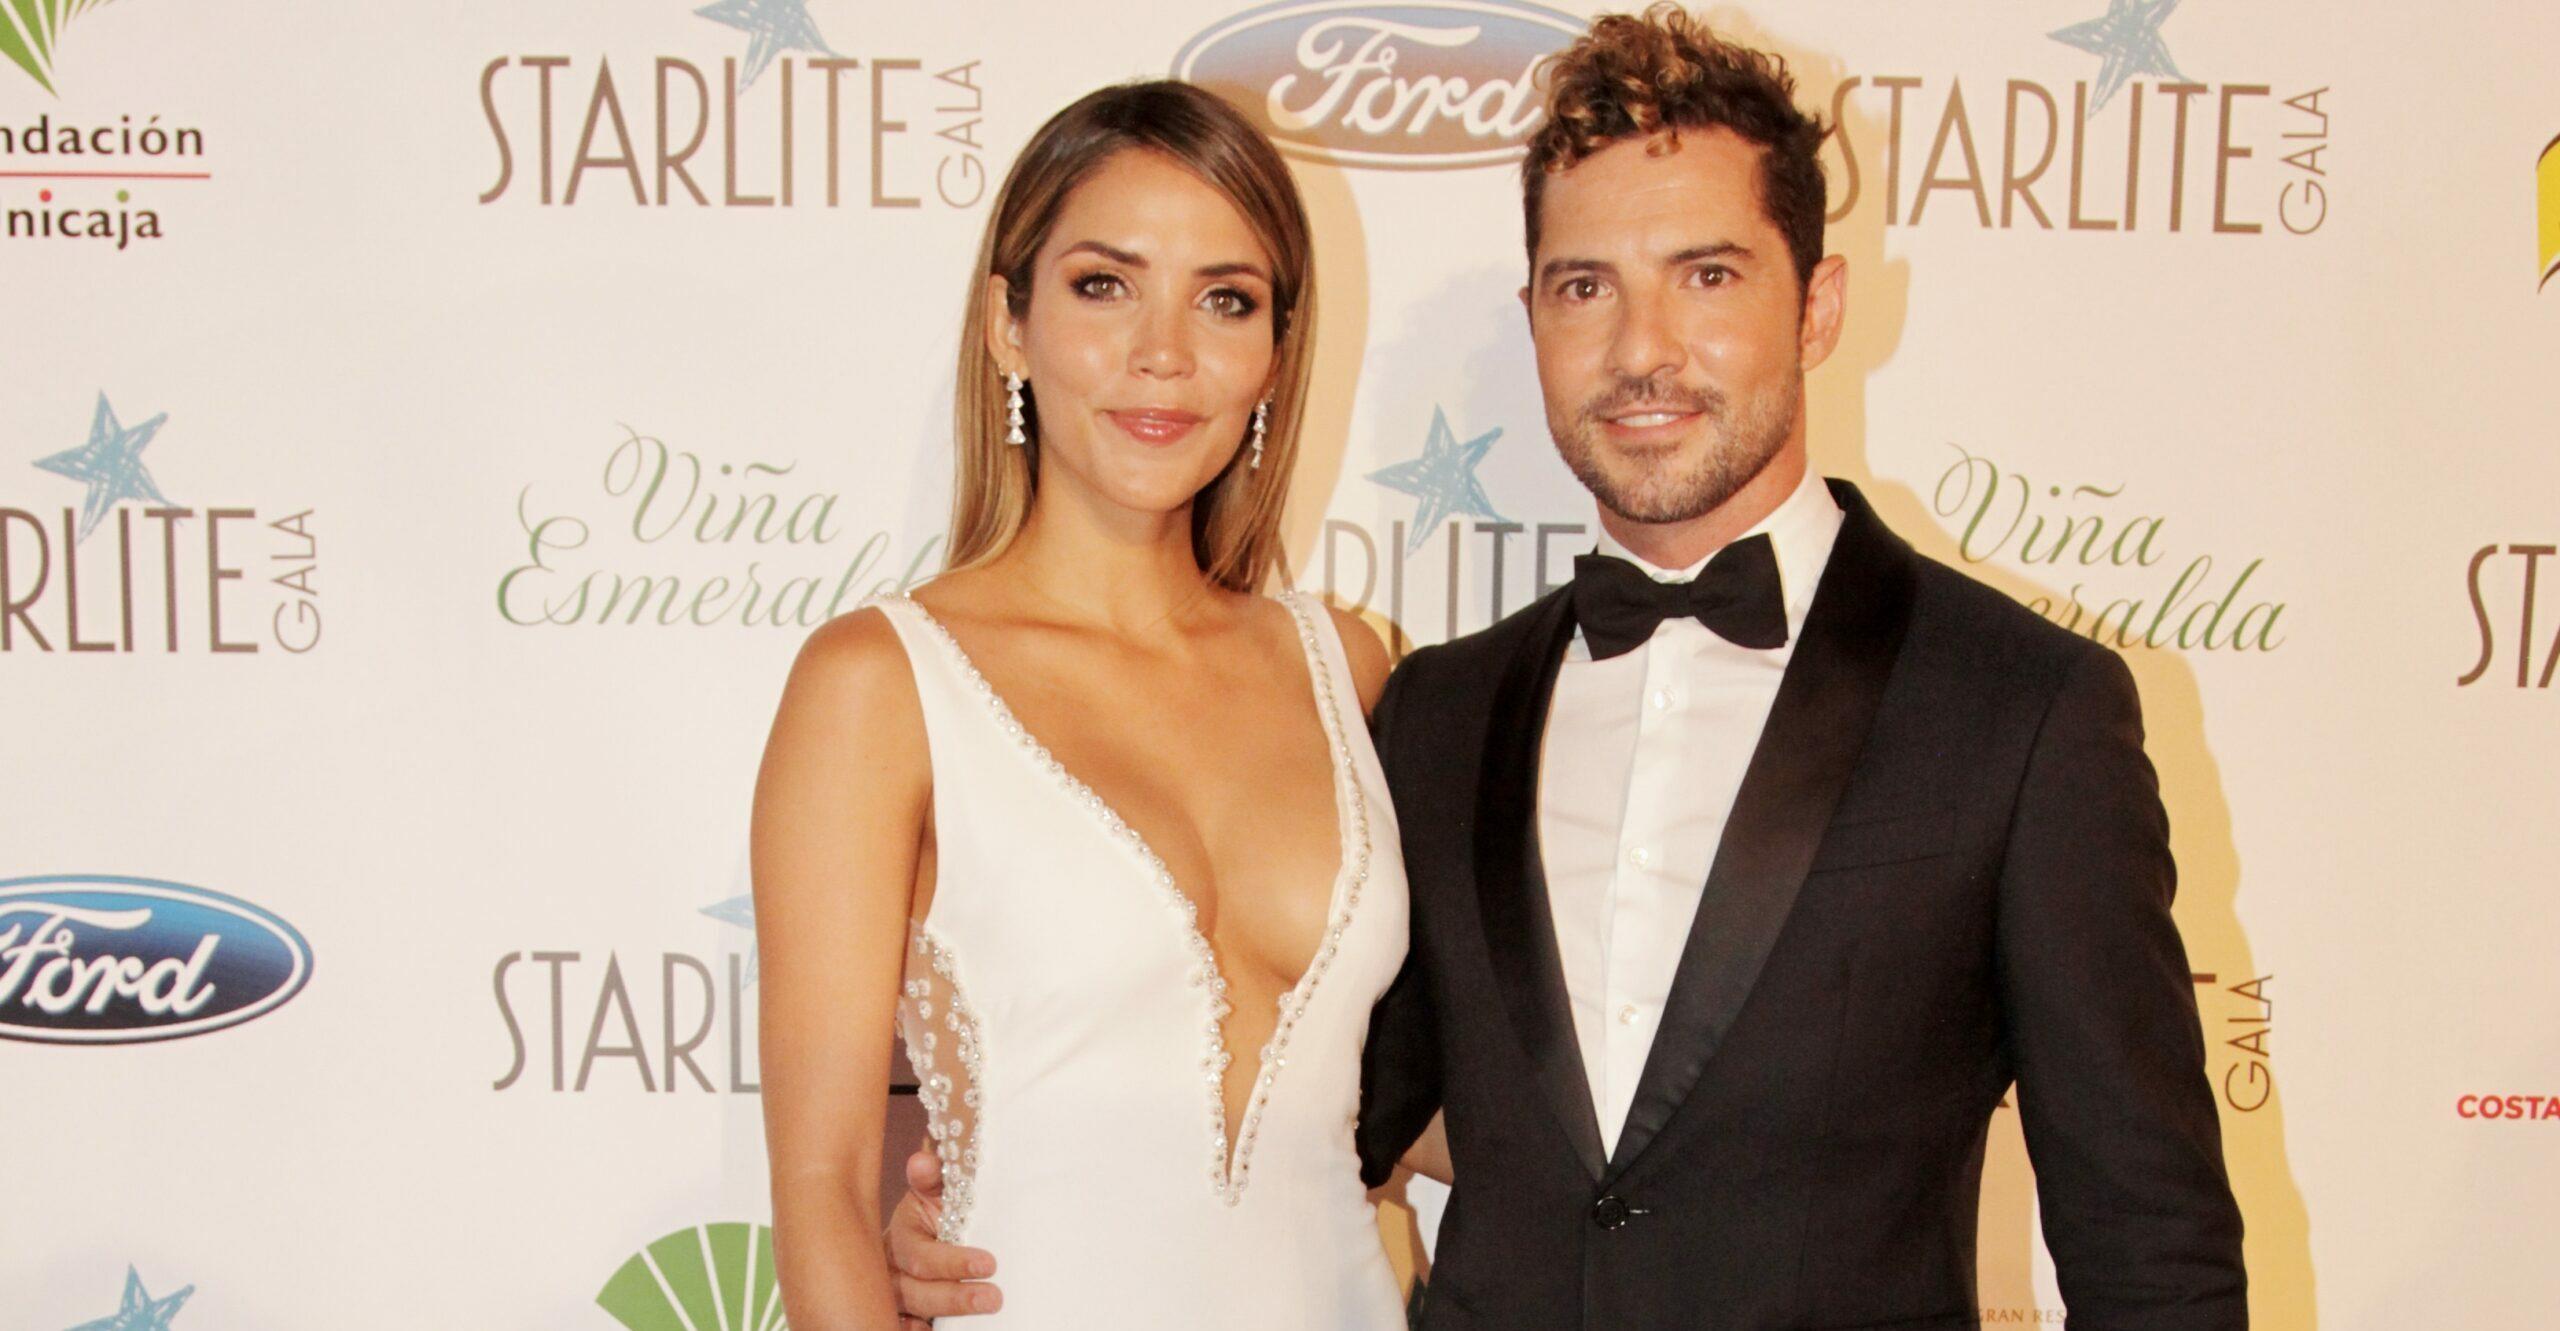 David Bisbal i Rosanna Zanetti, a la gala Starlite - Europa Press